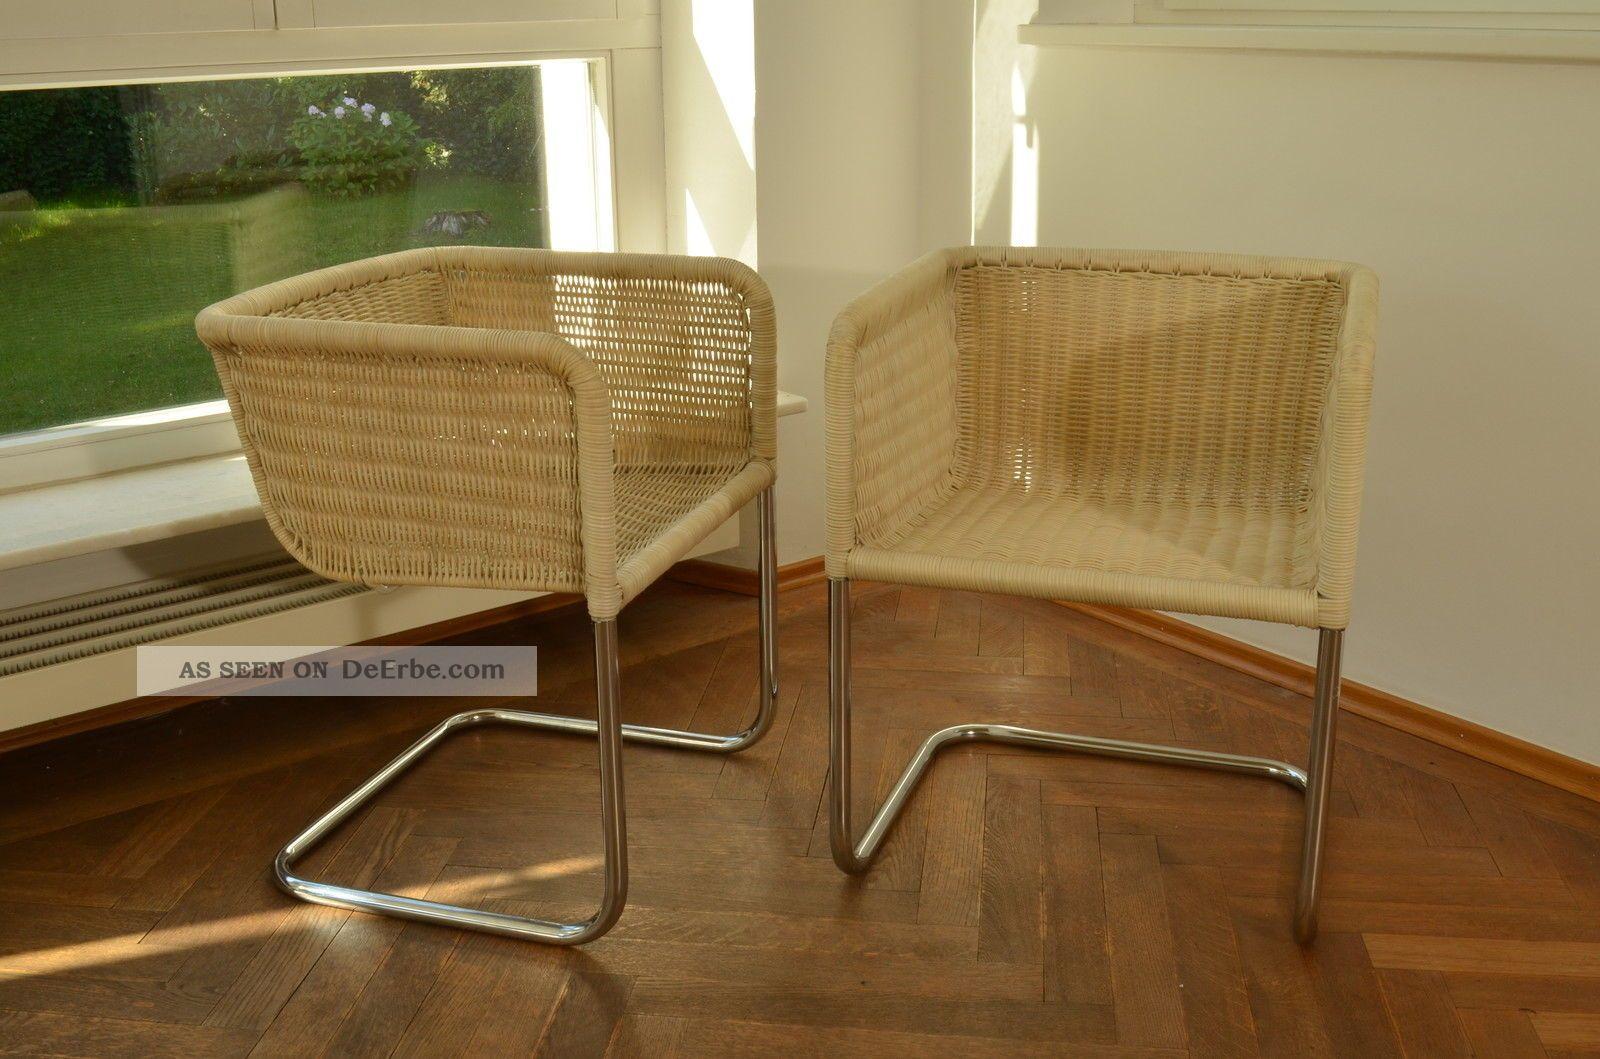 Design & Stil - 1970-1979 - Mobiliar & Interieur - Antiquitäten